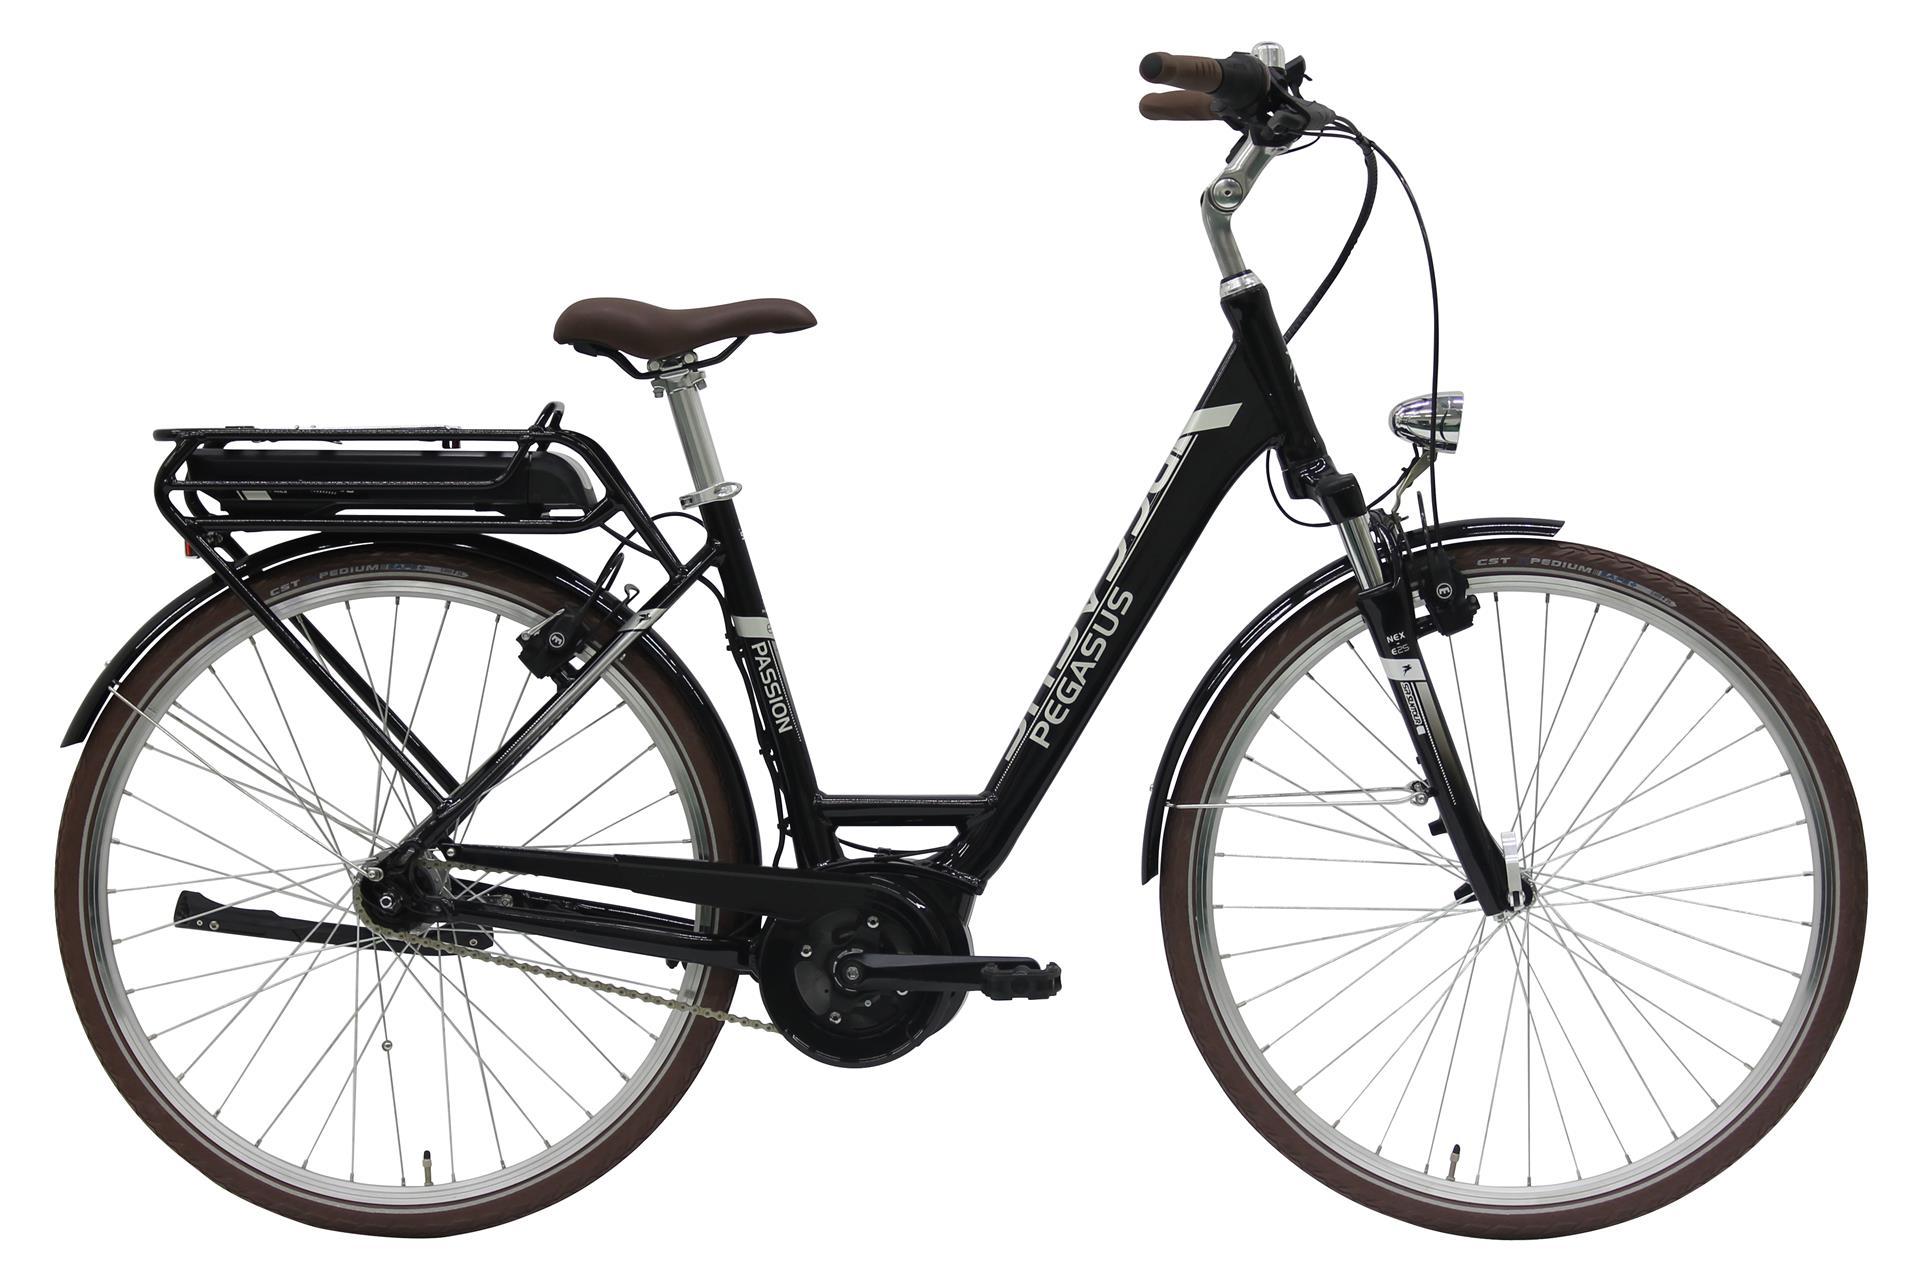 pegasus passion e7r 14 ah damen schwarz 2018 e bikes. Black Bedroom Furniture Sets. Home Design Ideas